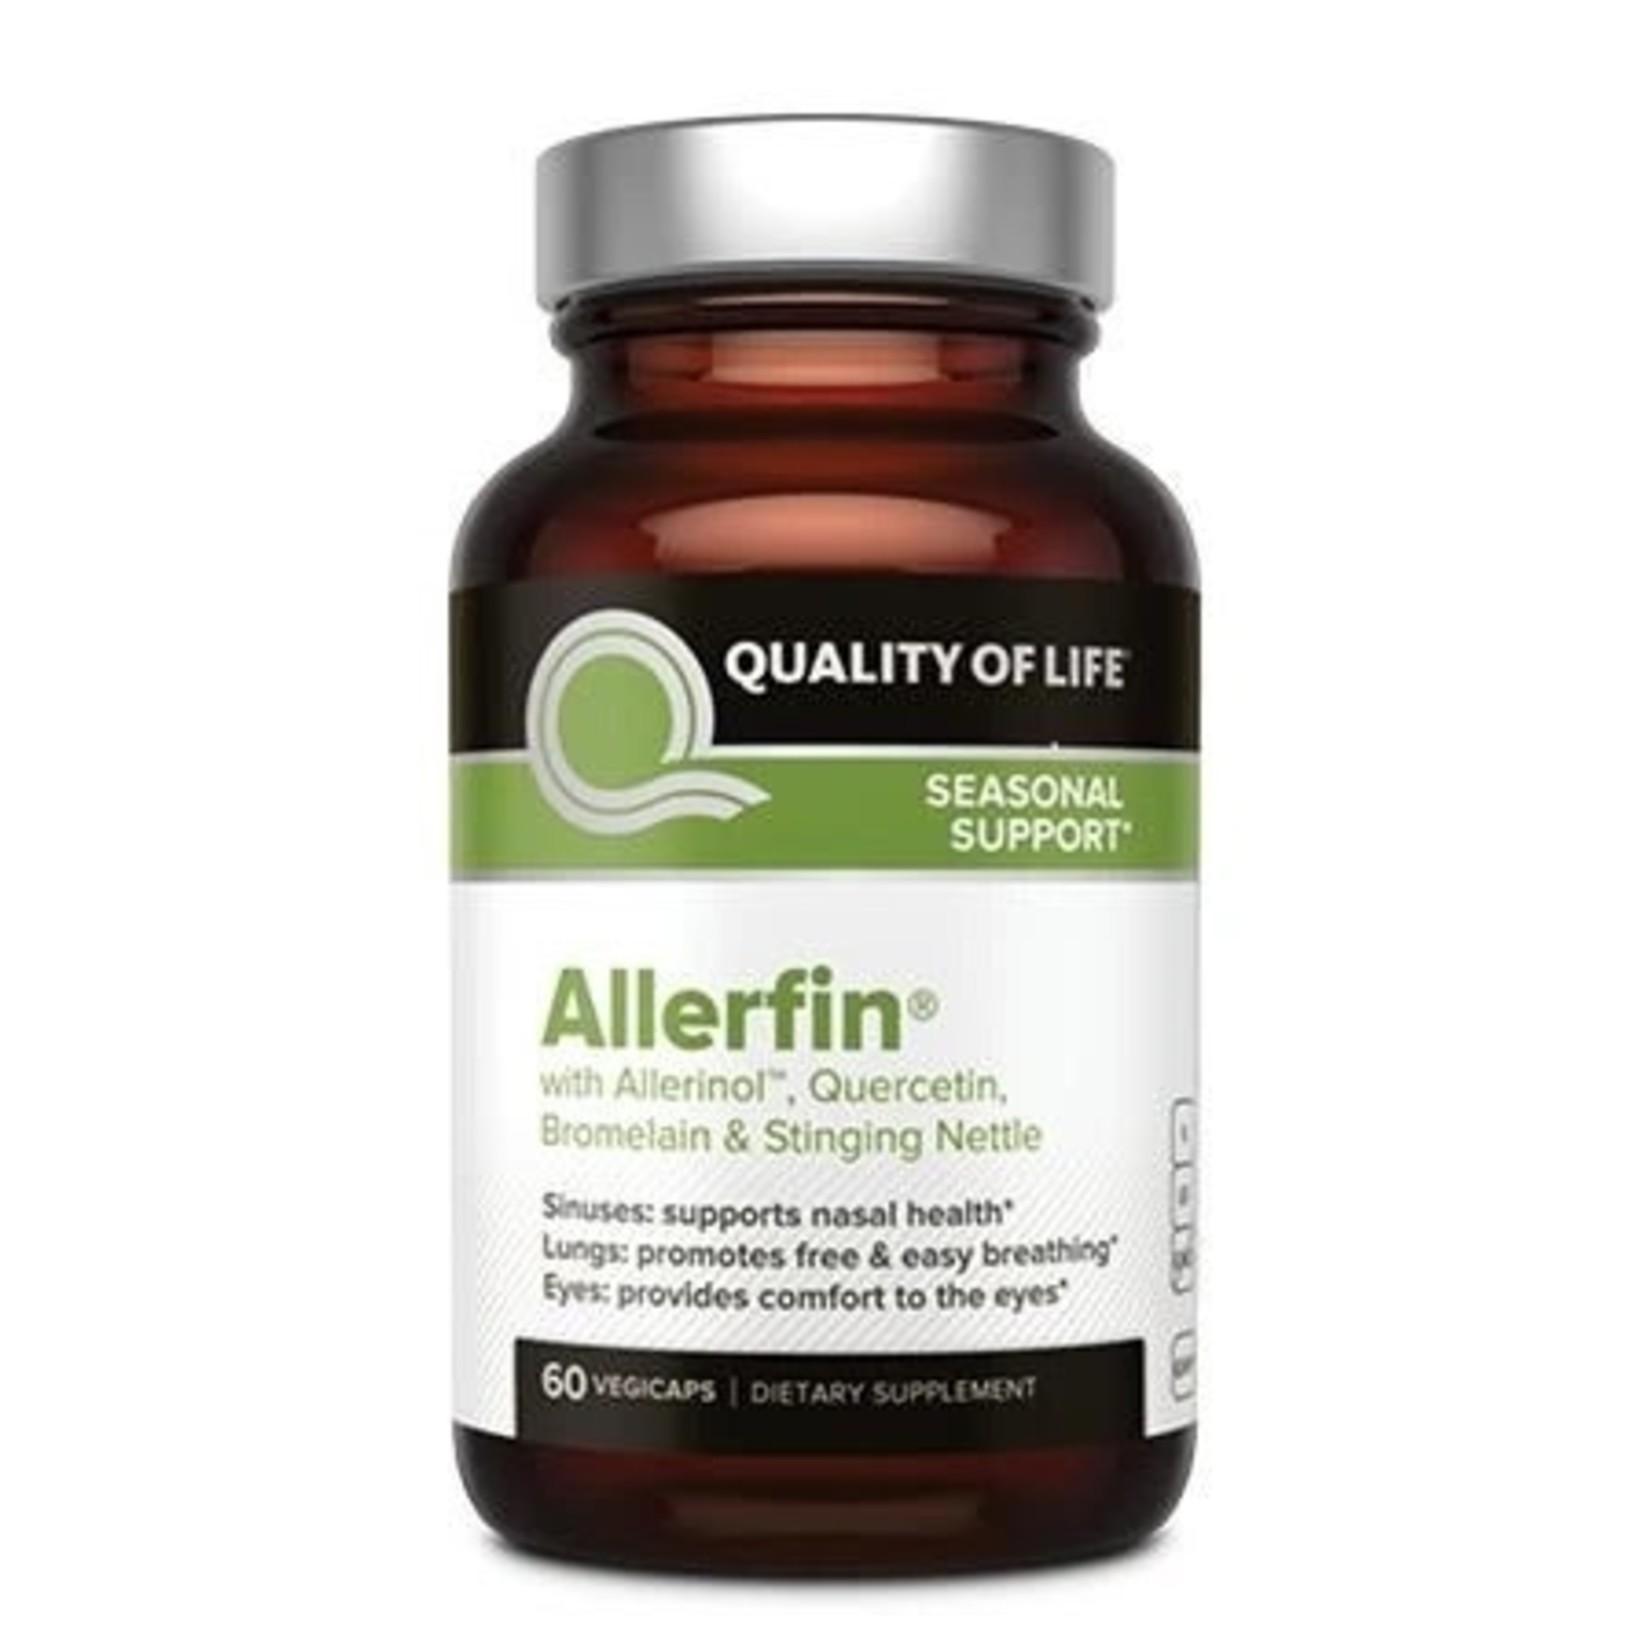 Quality of Life QOL Allerfin 60 vegicaps